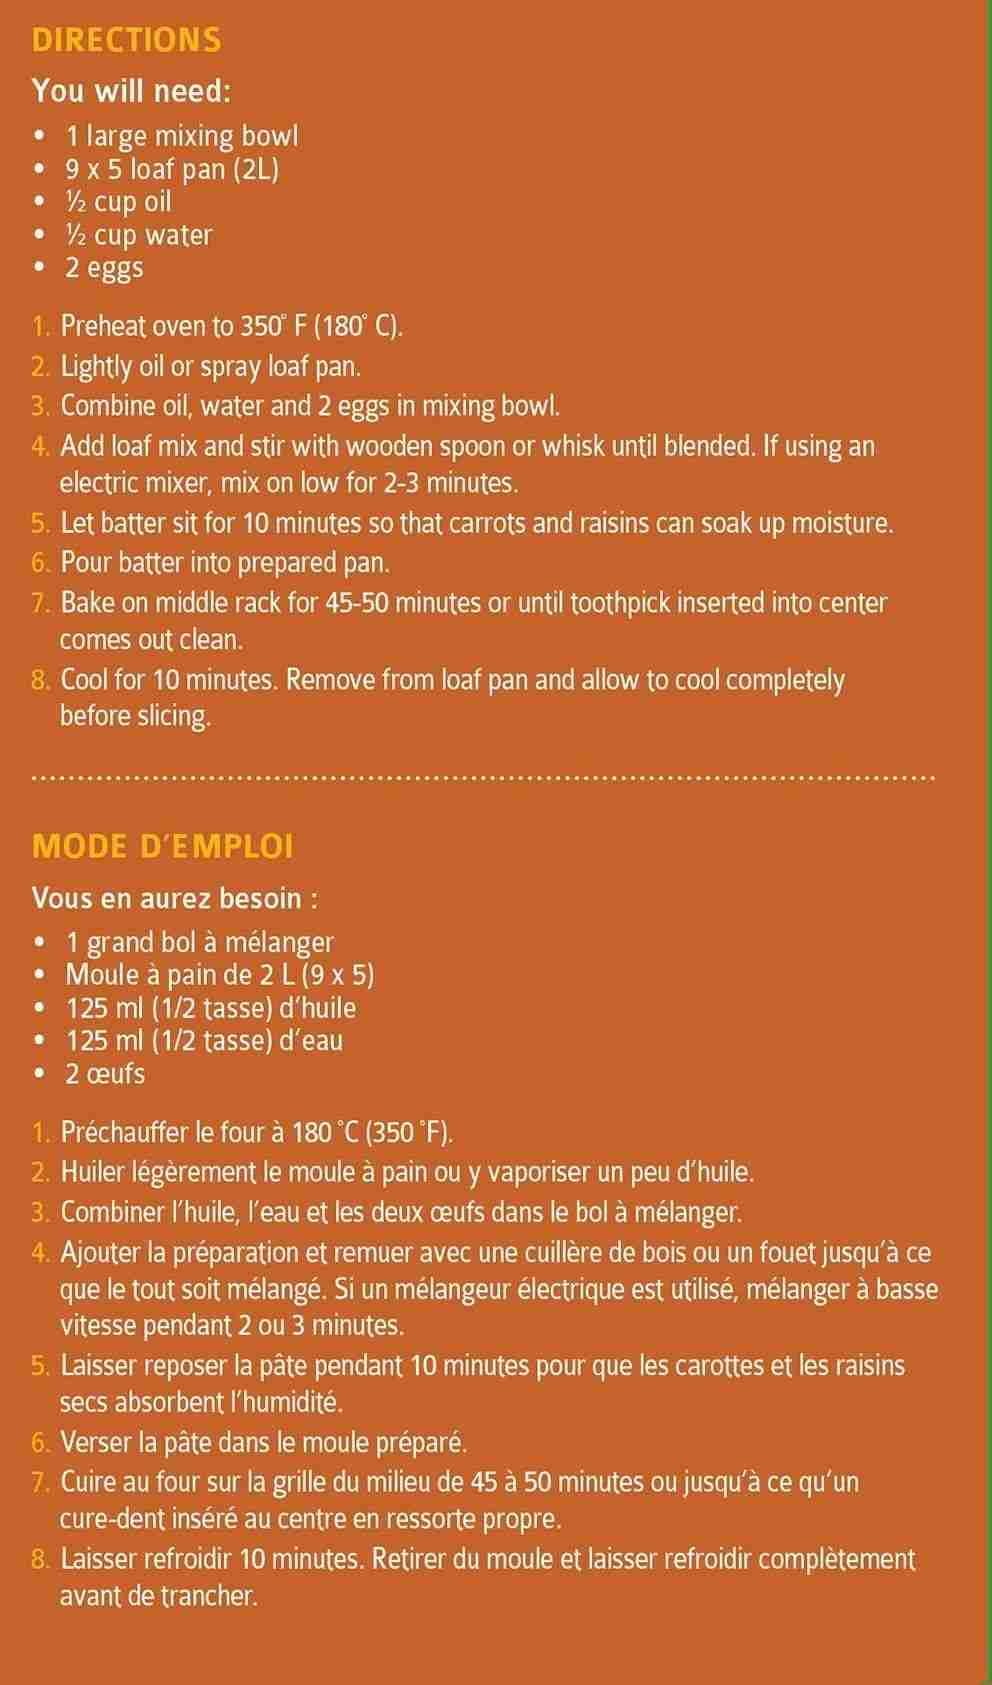 Carrot Cake Quickbread Mix | Carrot Cake | 18 oz. Box